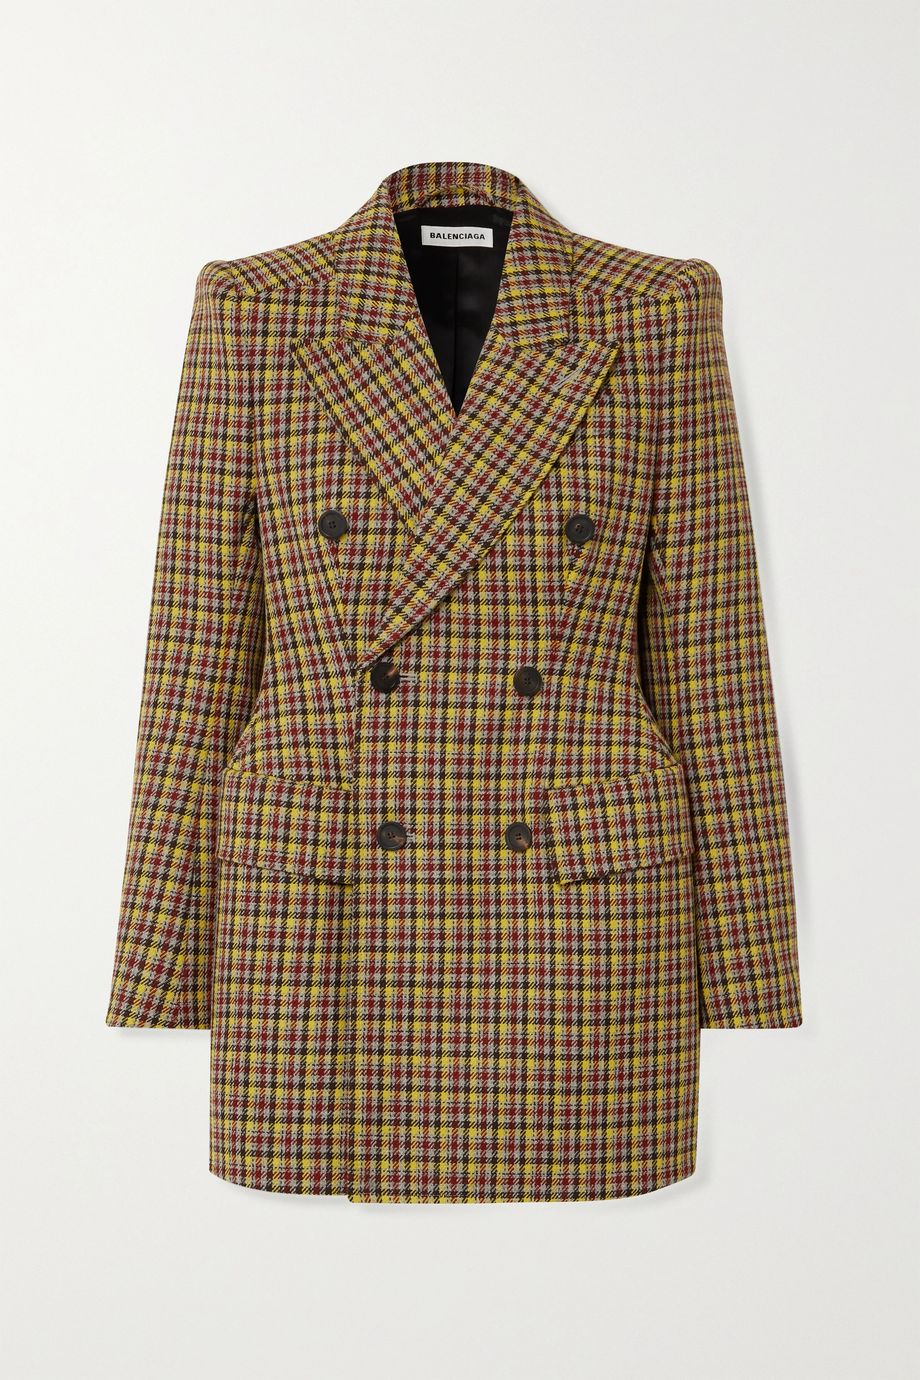 Balenciaga Double-breasted checked wool blazer